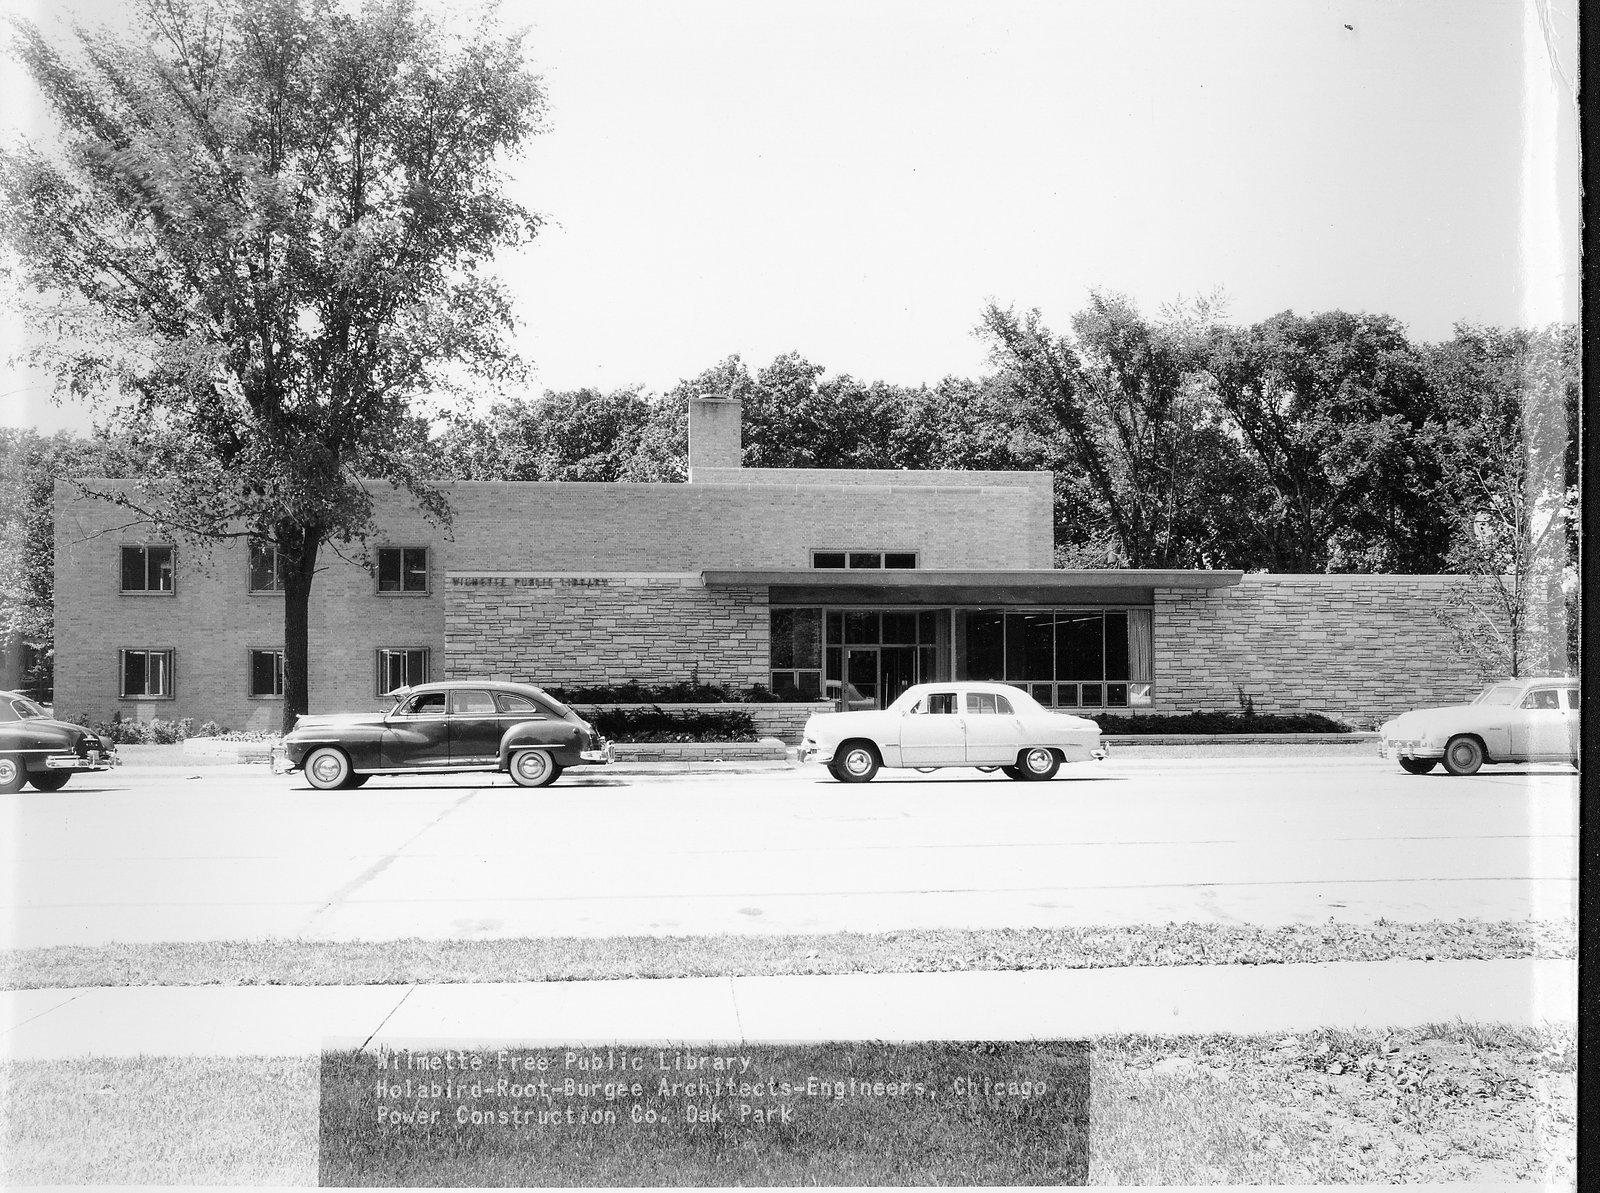 Wilmette Public Library construction No. 13